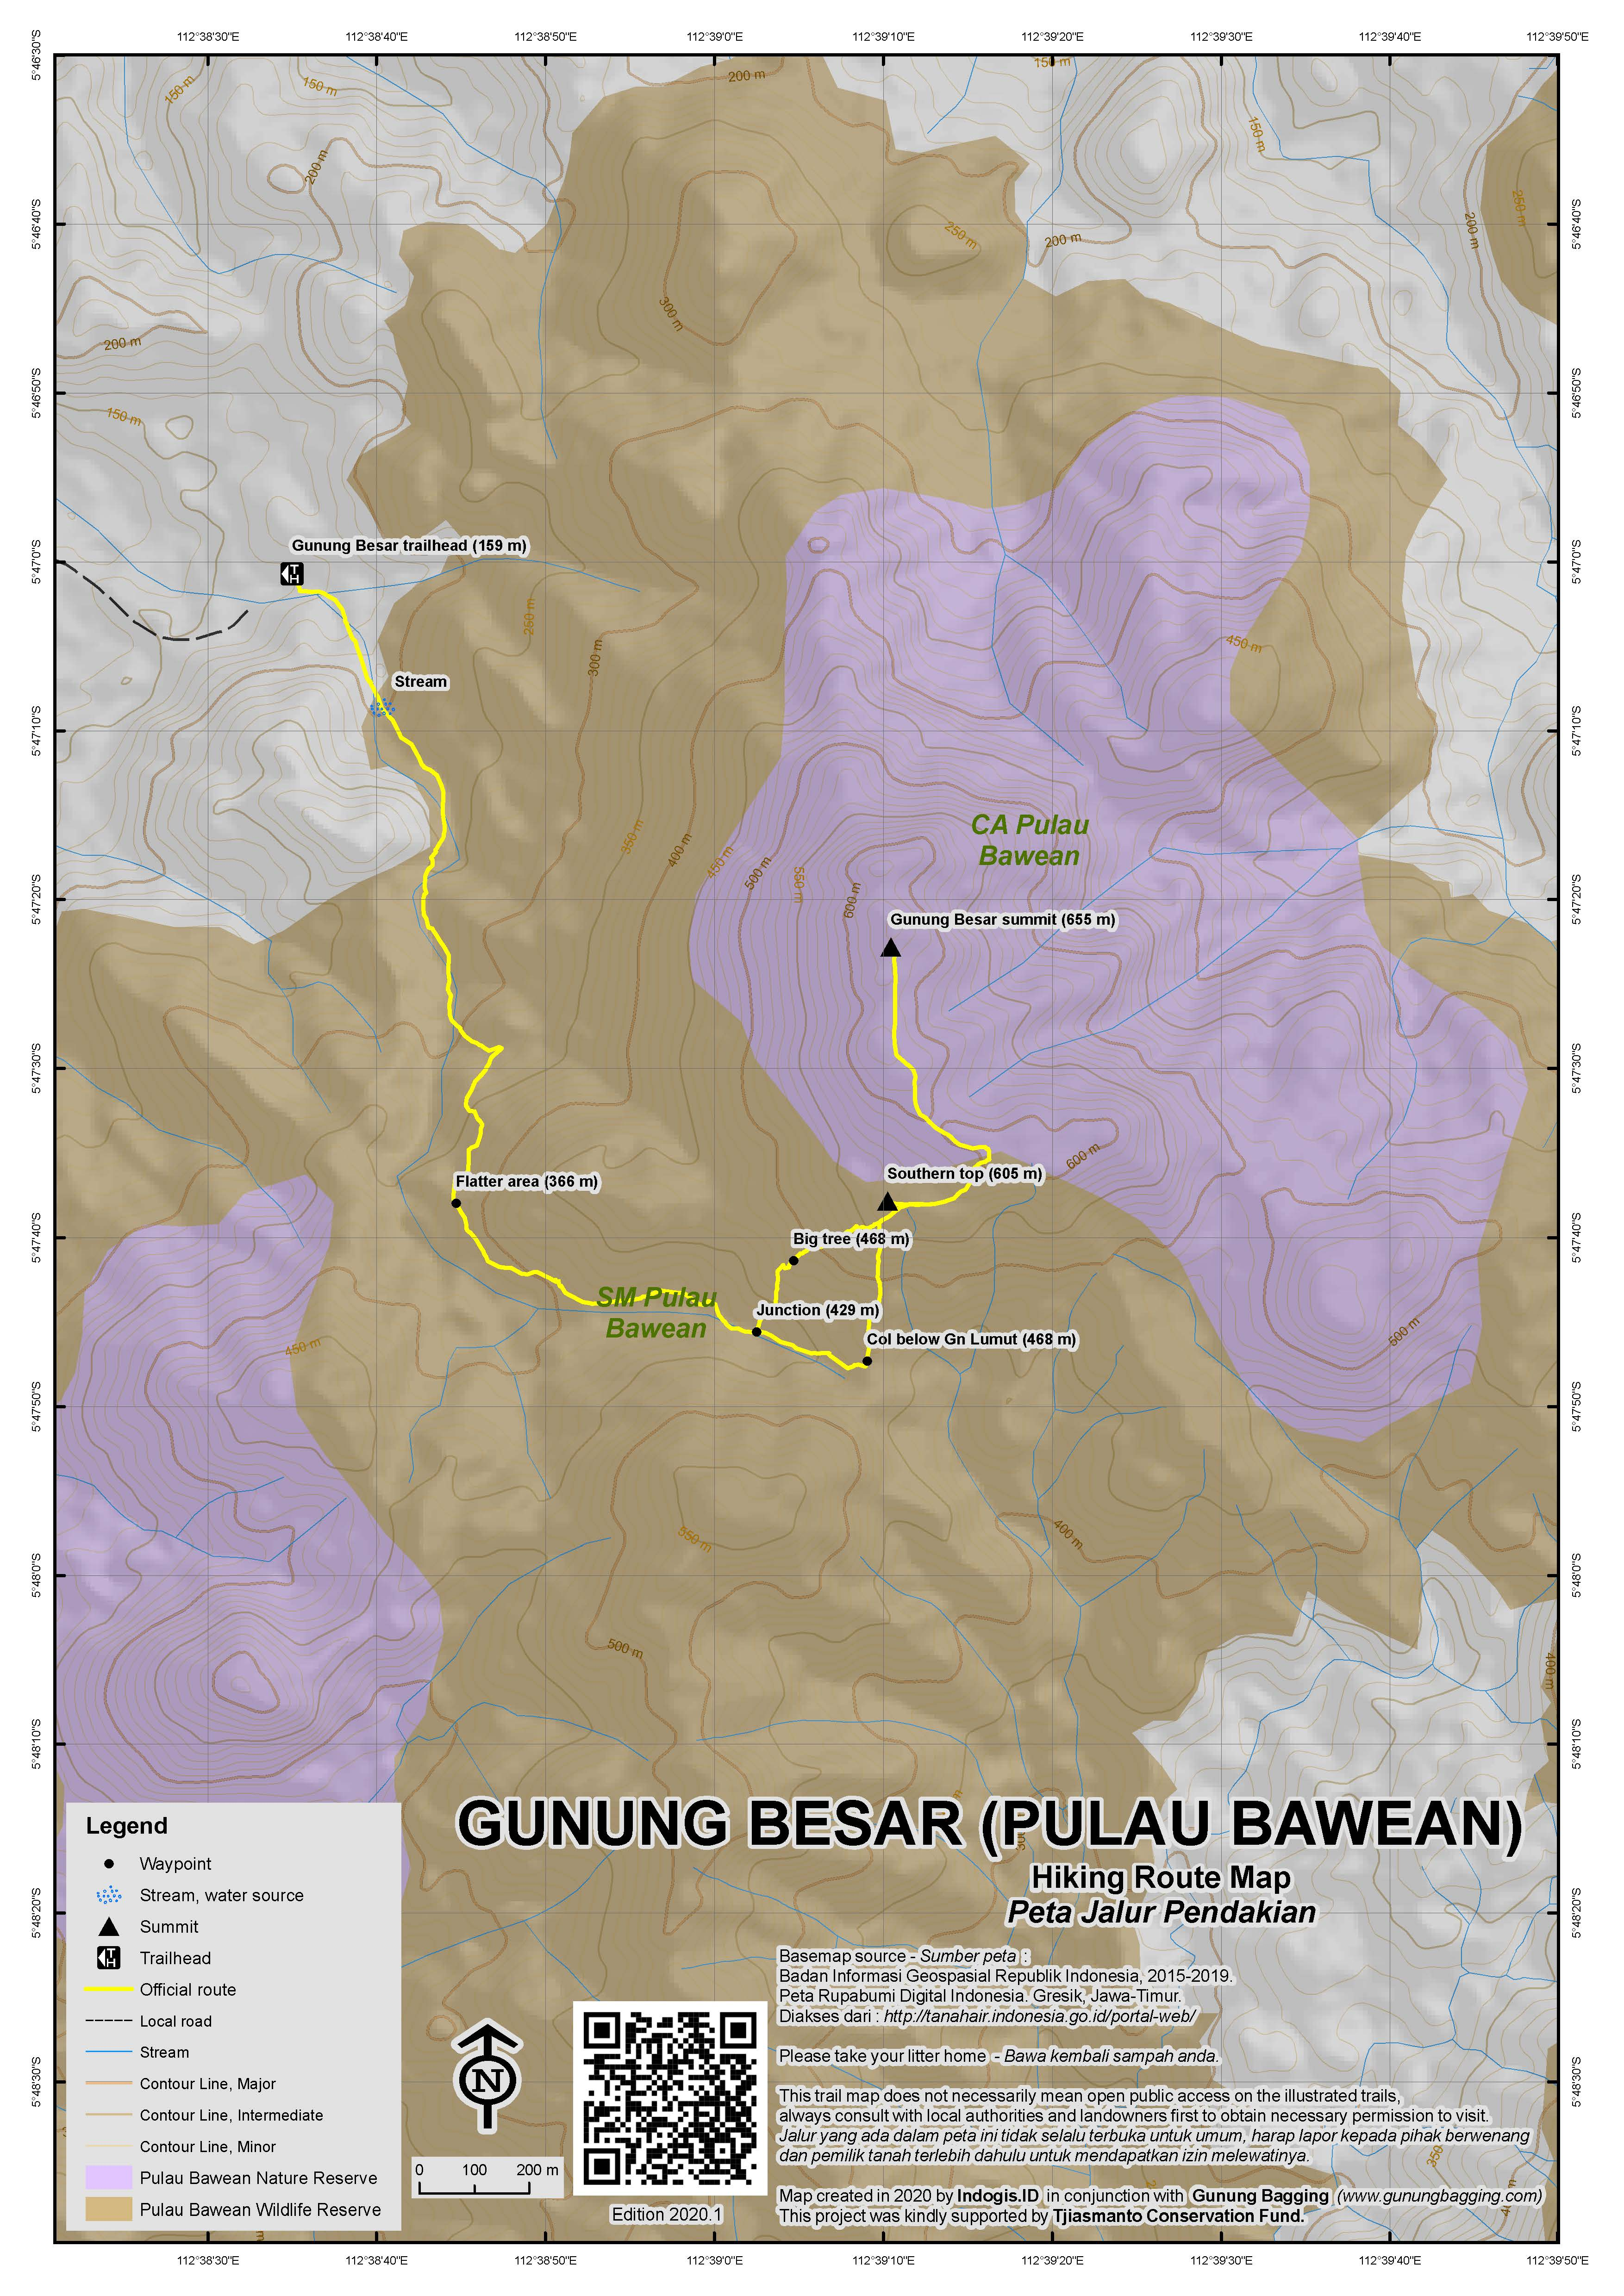 Peta Jalur Pendakian Gunung Besar (Pulau Bawean)